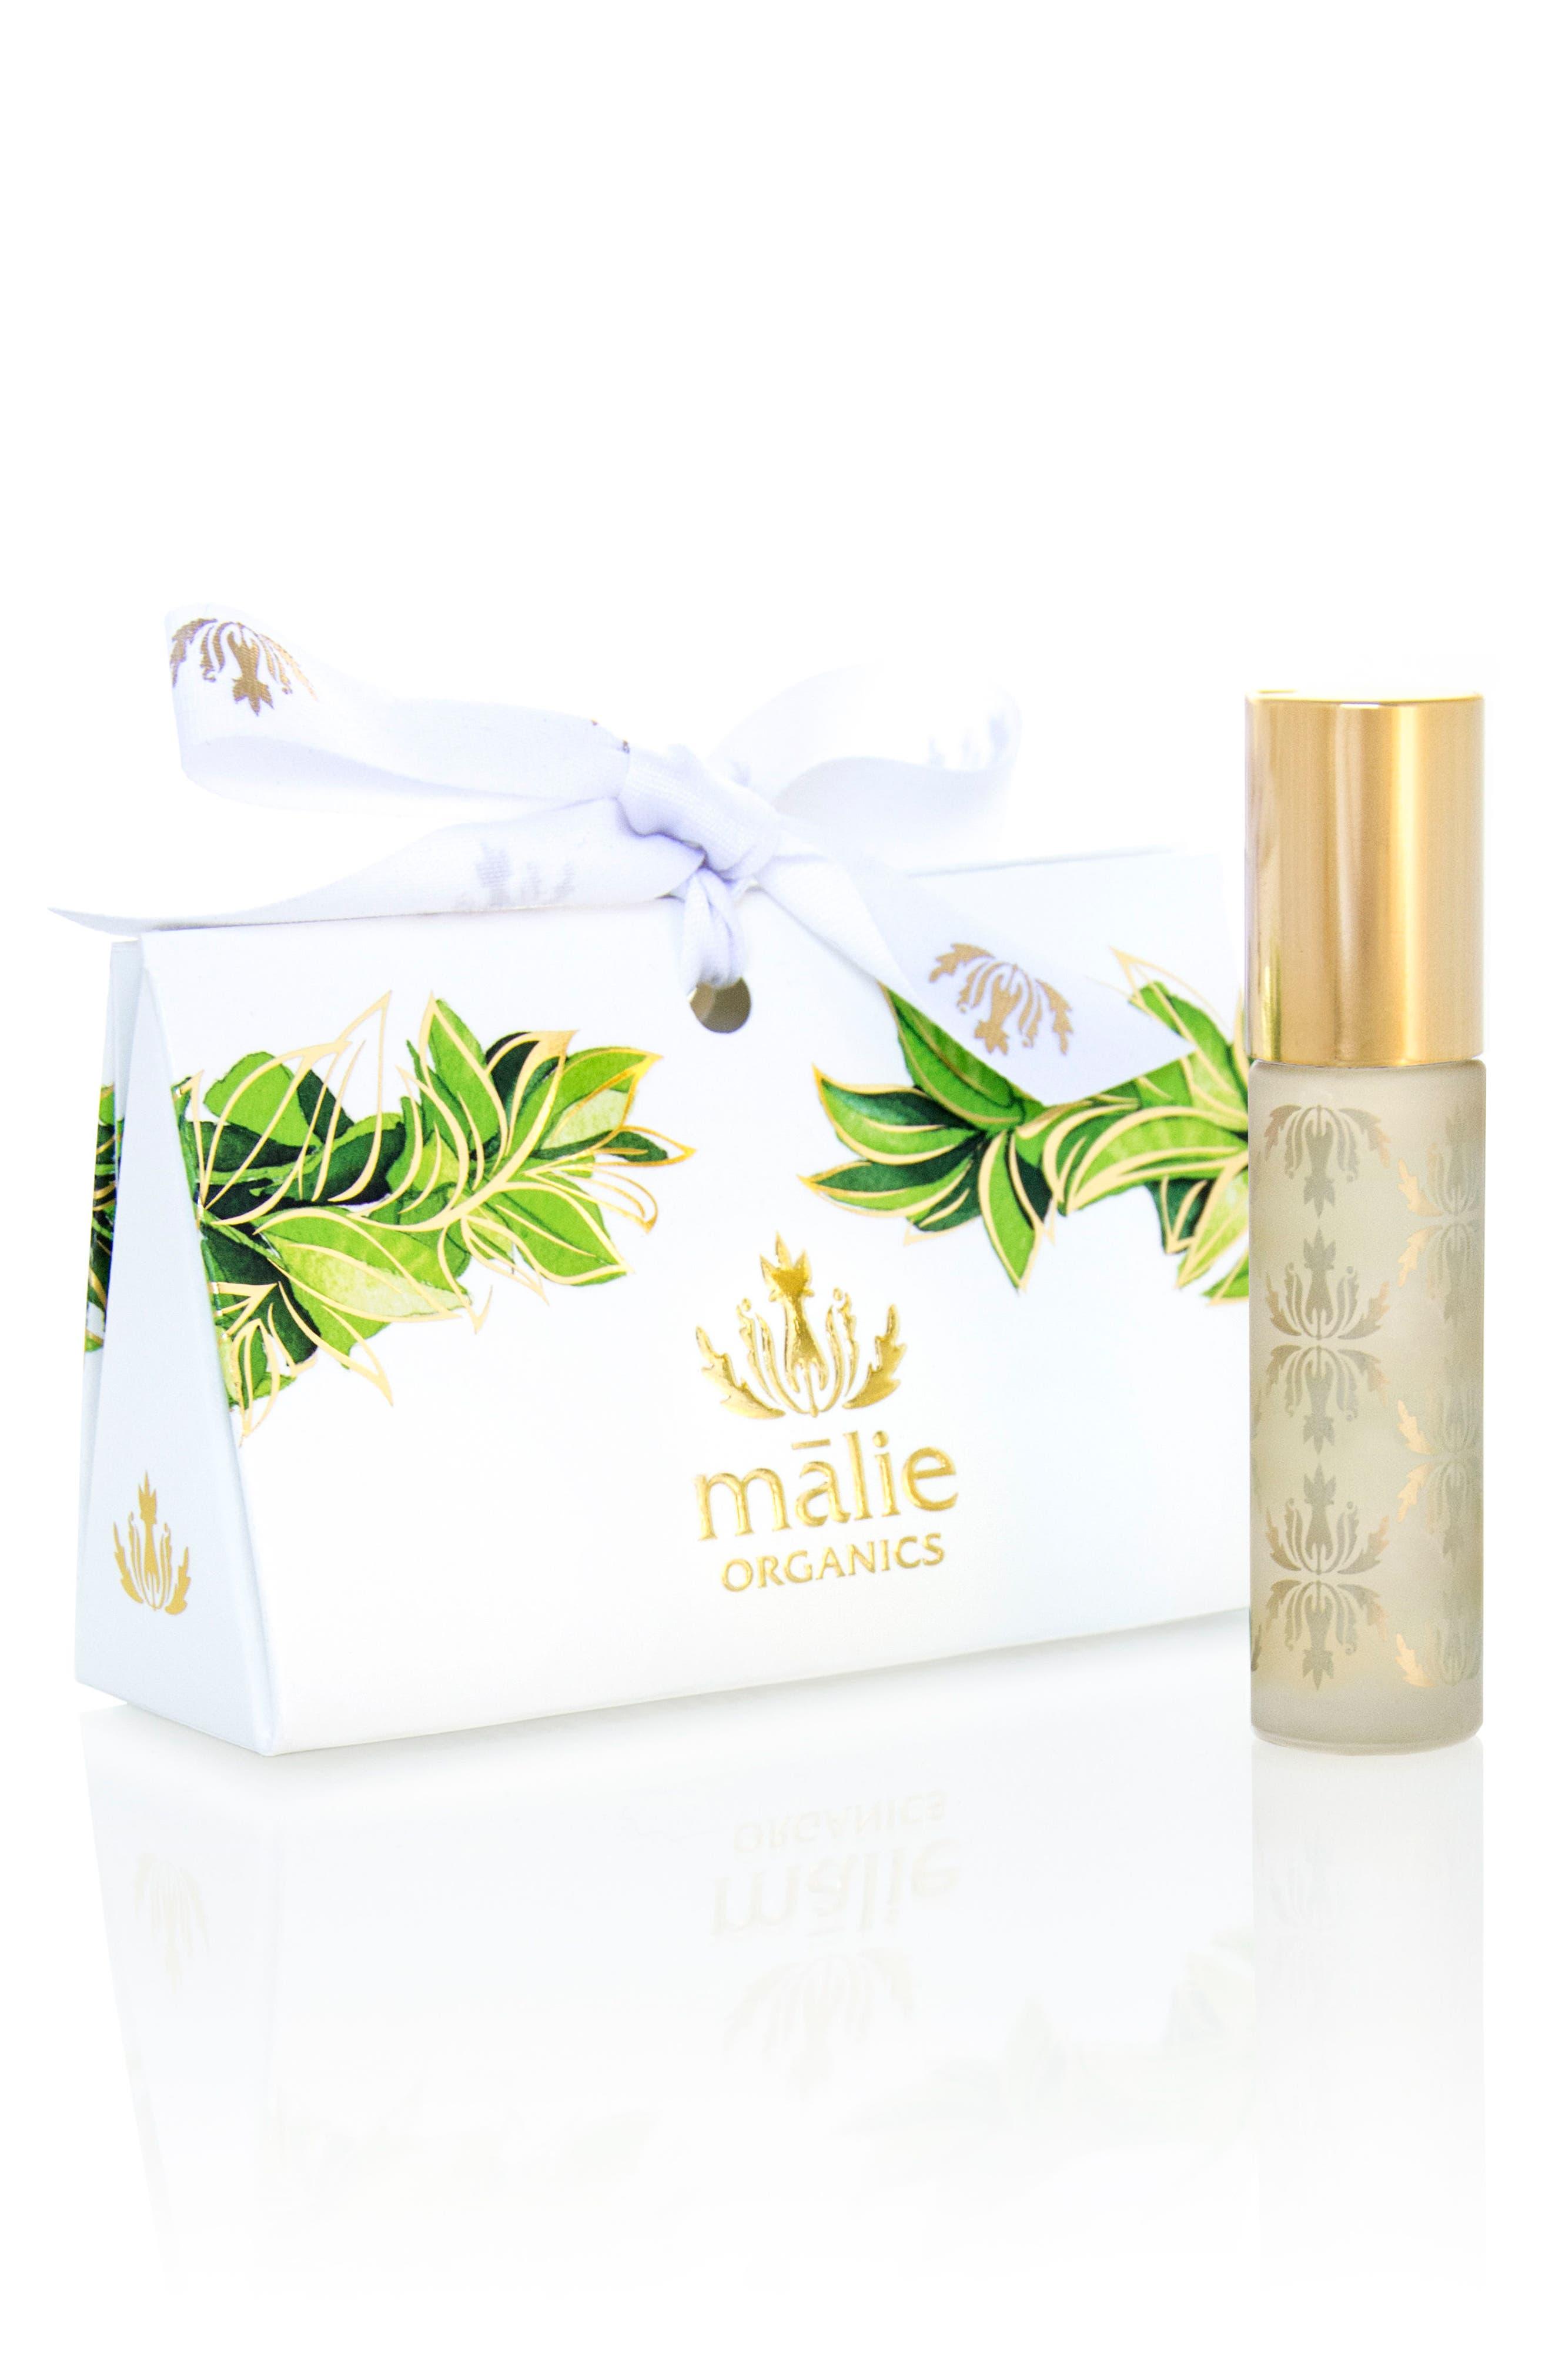 Malie Organics Koke'e Organic Roll-On Perfume Oil